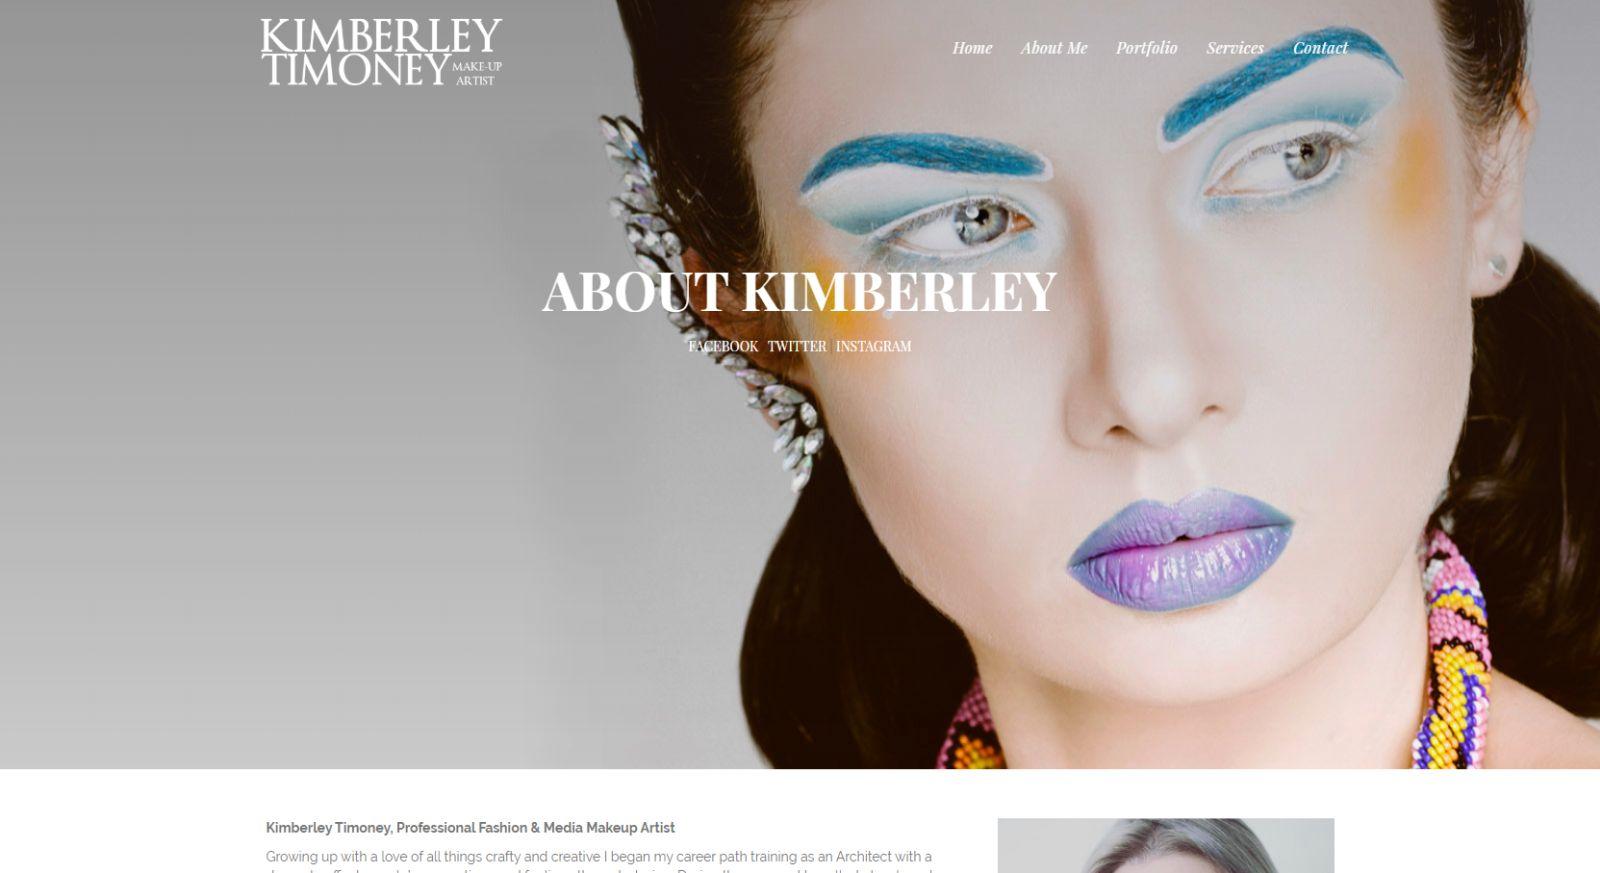 Kimberly Timoney Website Development About